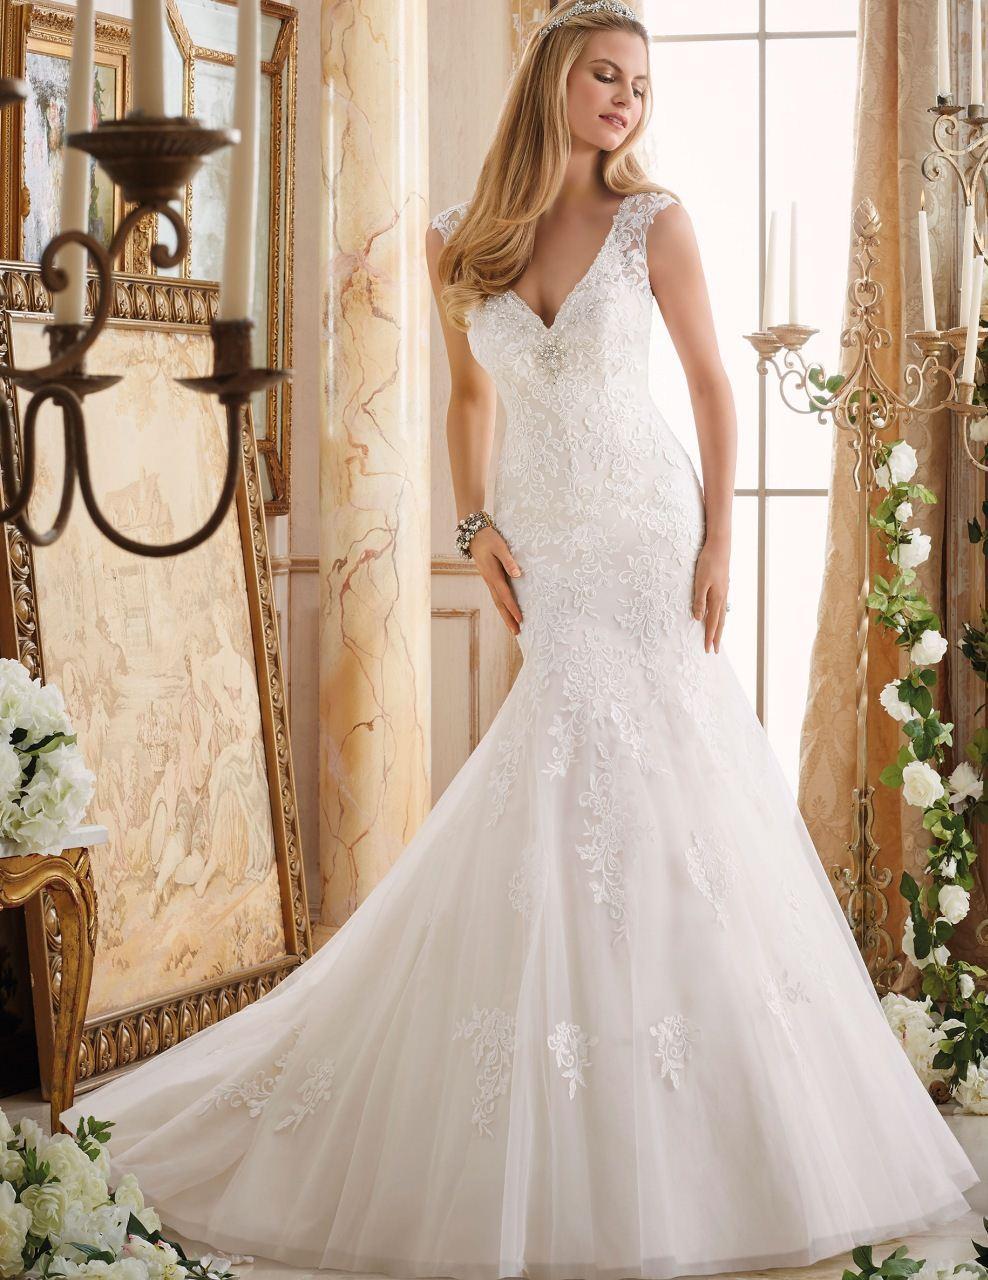 Lace Vintage Wedding Dress 2017 V Neck Beaded Women Sexy Mermaid